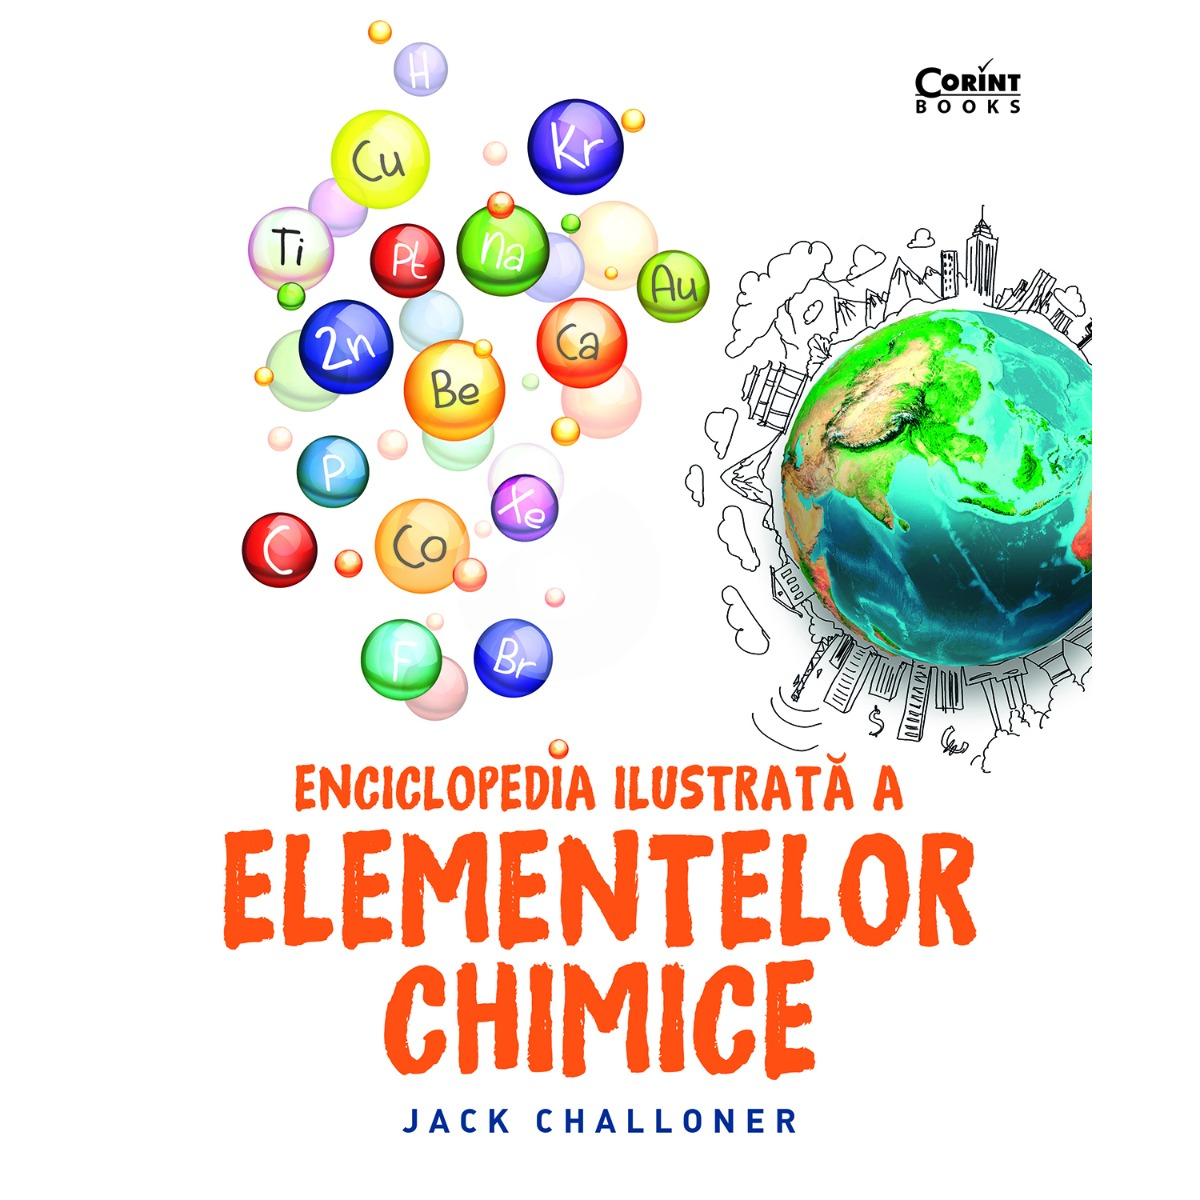 Carte Editura Corint, Enciclopedia ilustrata a elementelor chimice, Jack Challoner